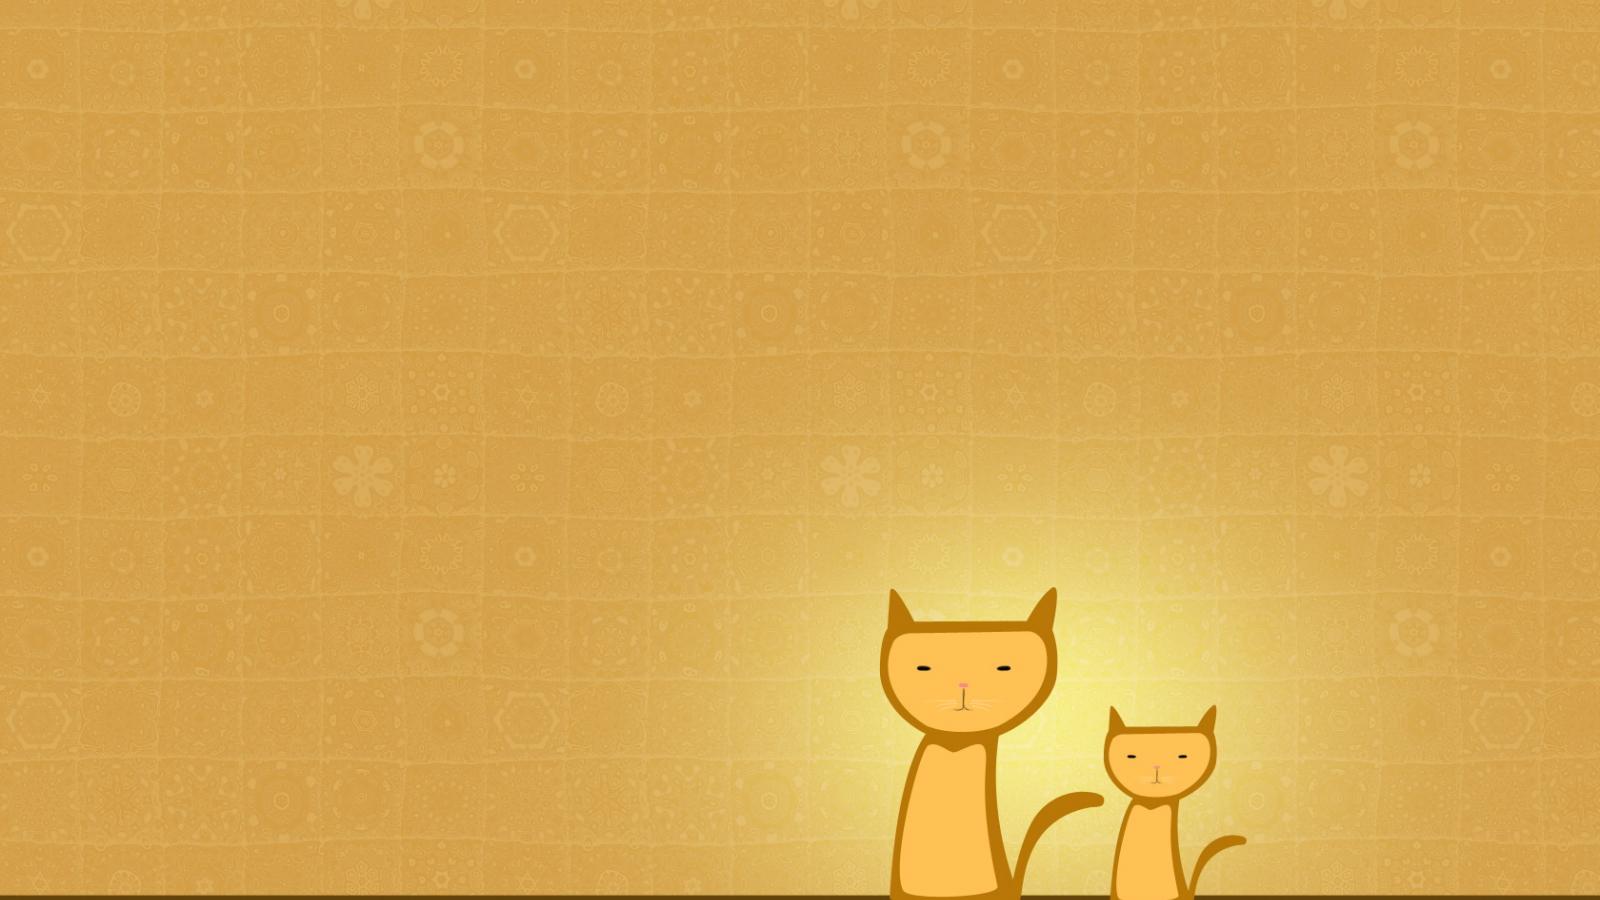 Free Download Cute Kitten Cartoon Wallpaper Comics Desktop Background Cartoon 1680x1050 For Your Desktop Mobile Tablet Explore 46 Cute Cartoon Cat Wallpaper Cute 3d Wallpaper 3d Cute Wallpapers For